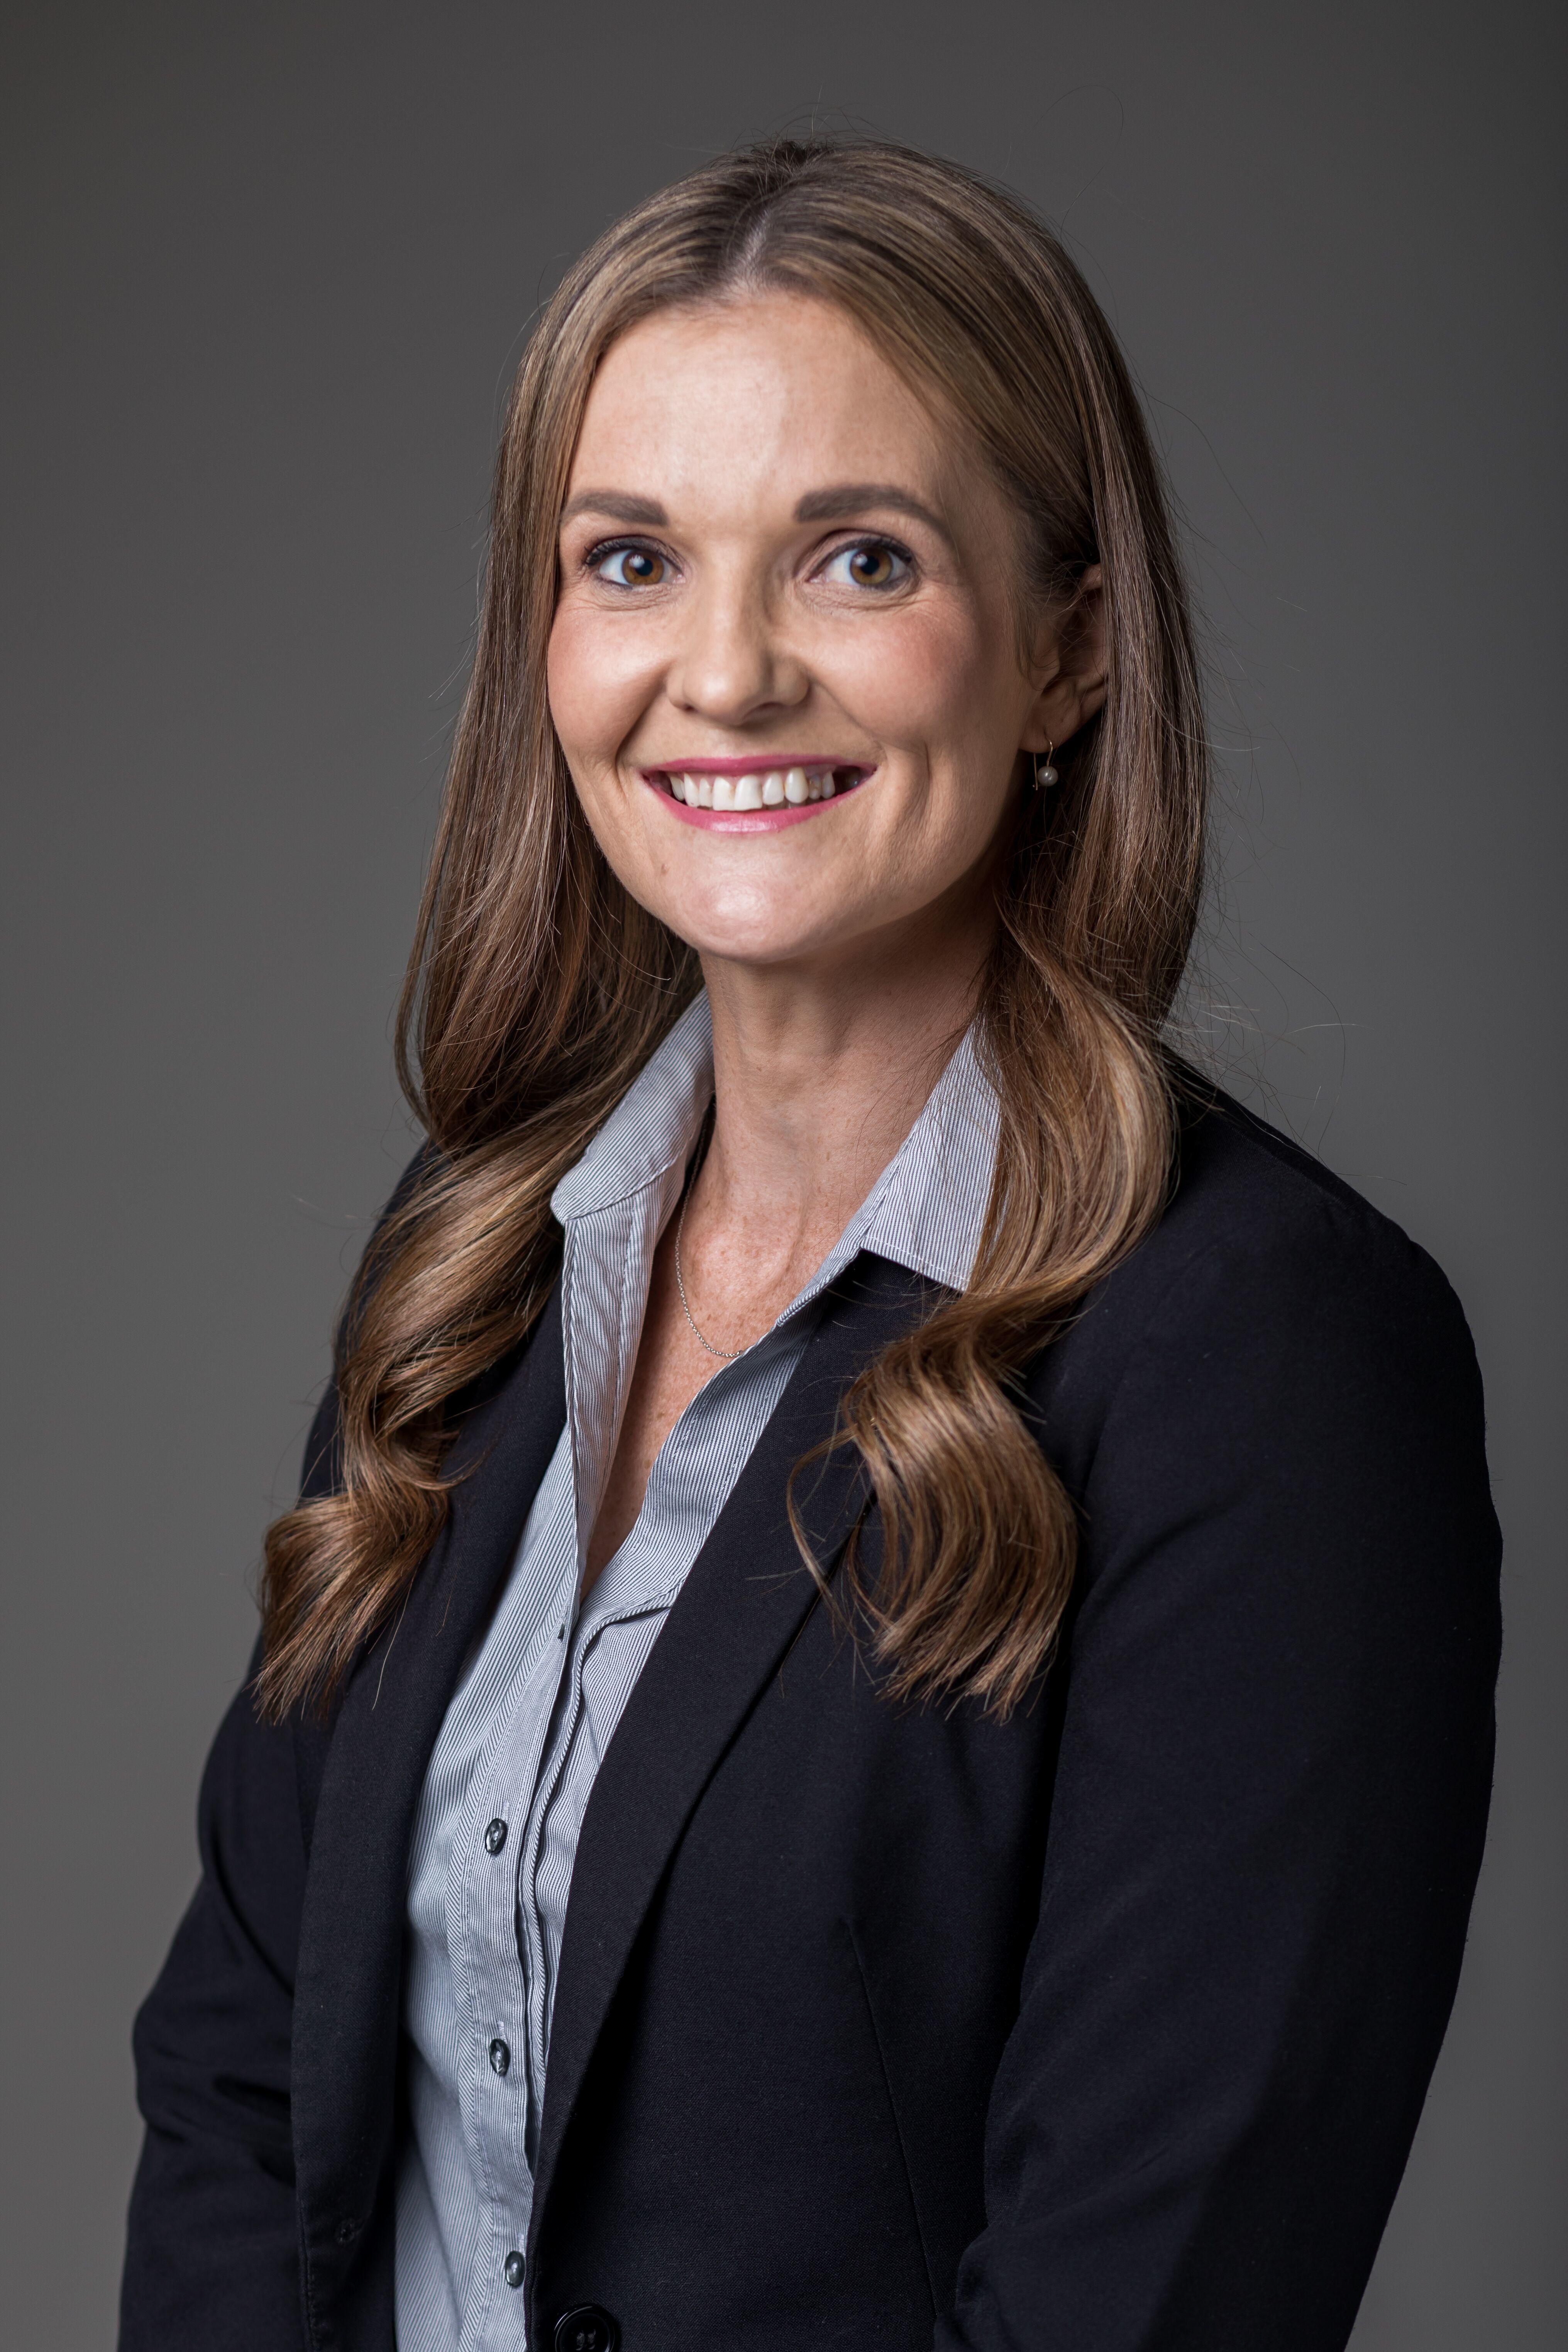 Nicole Kemp